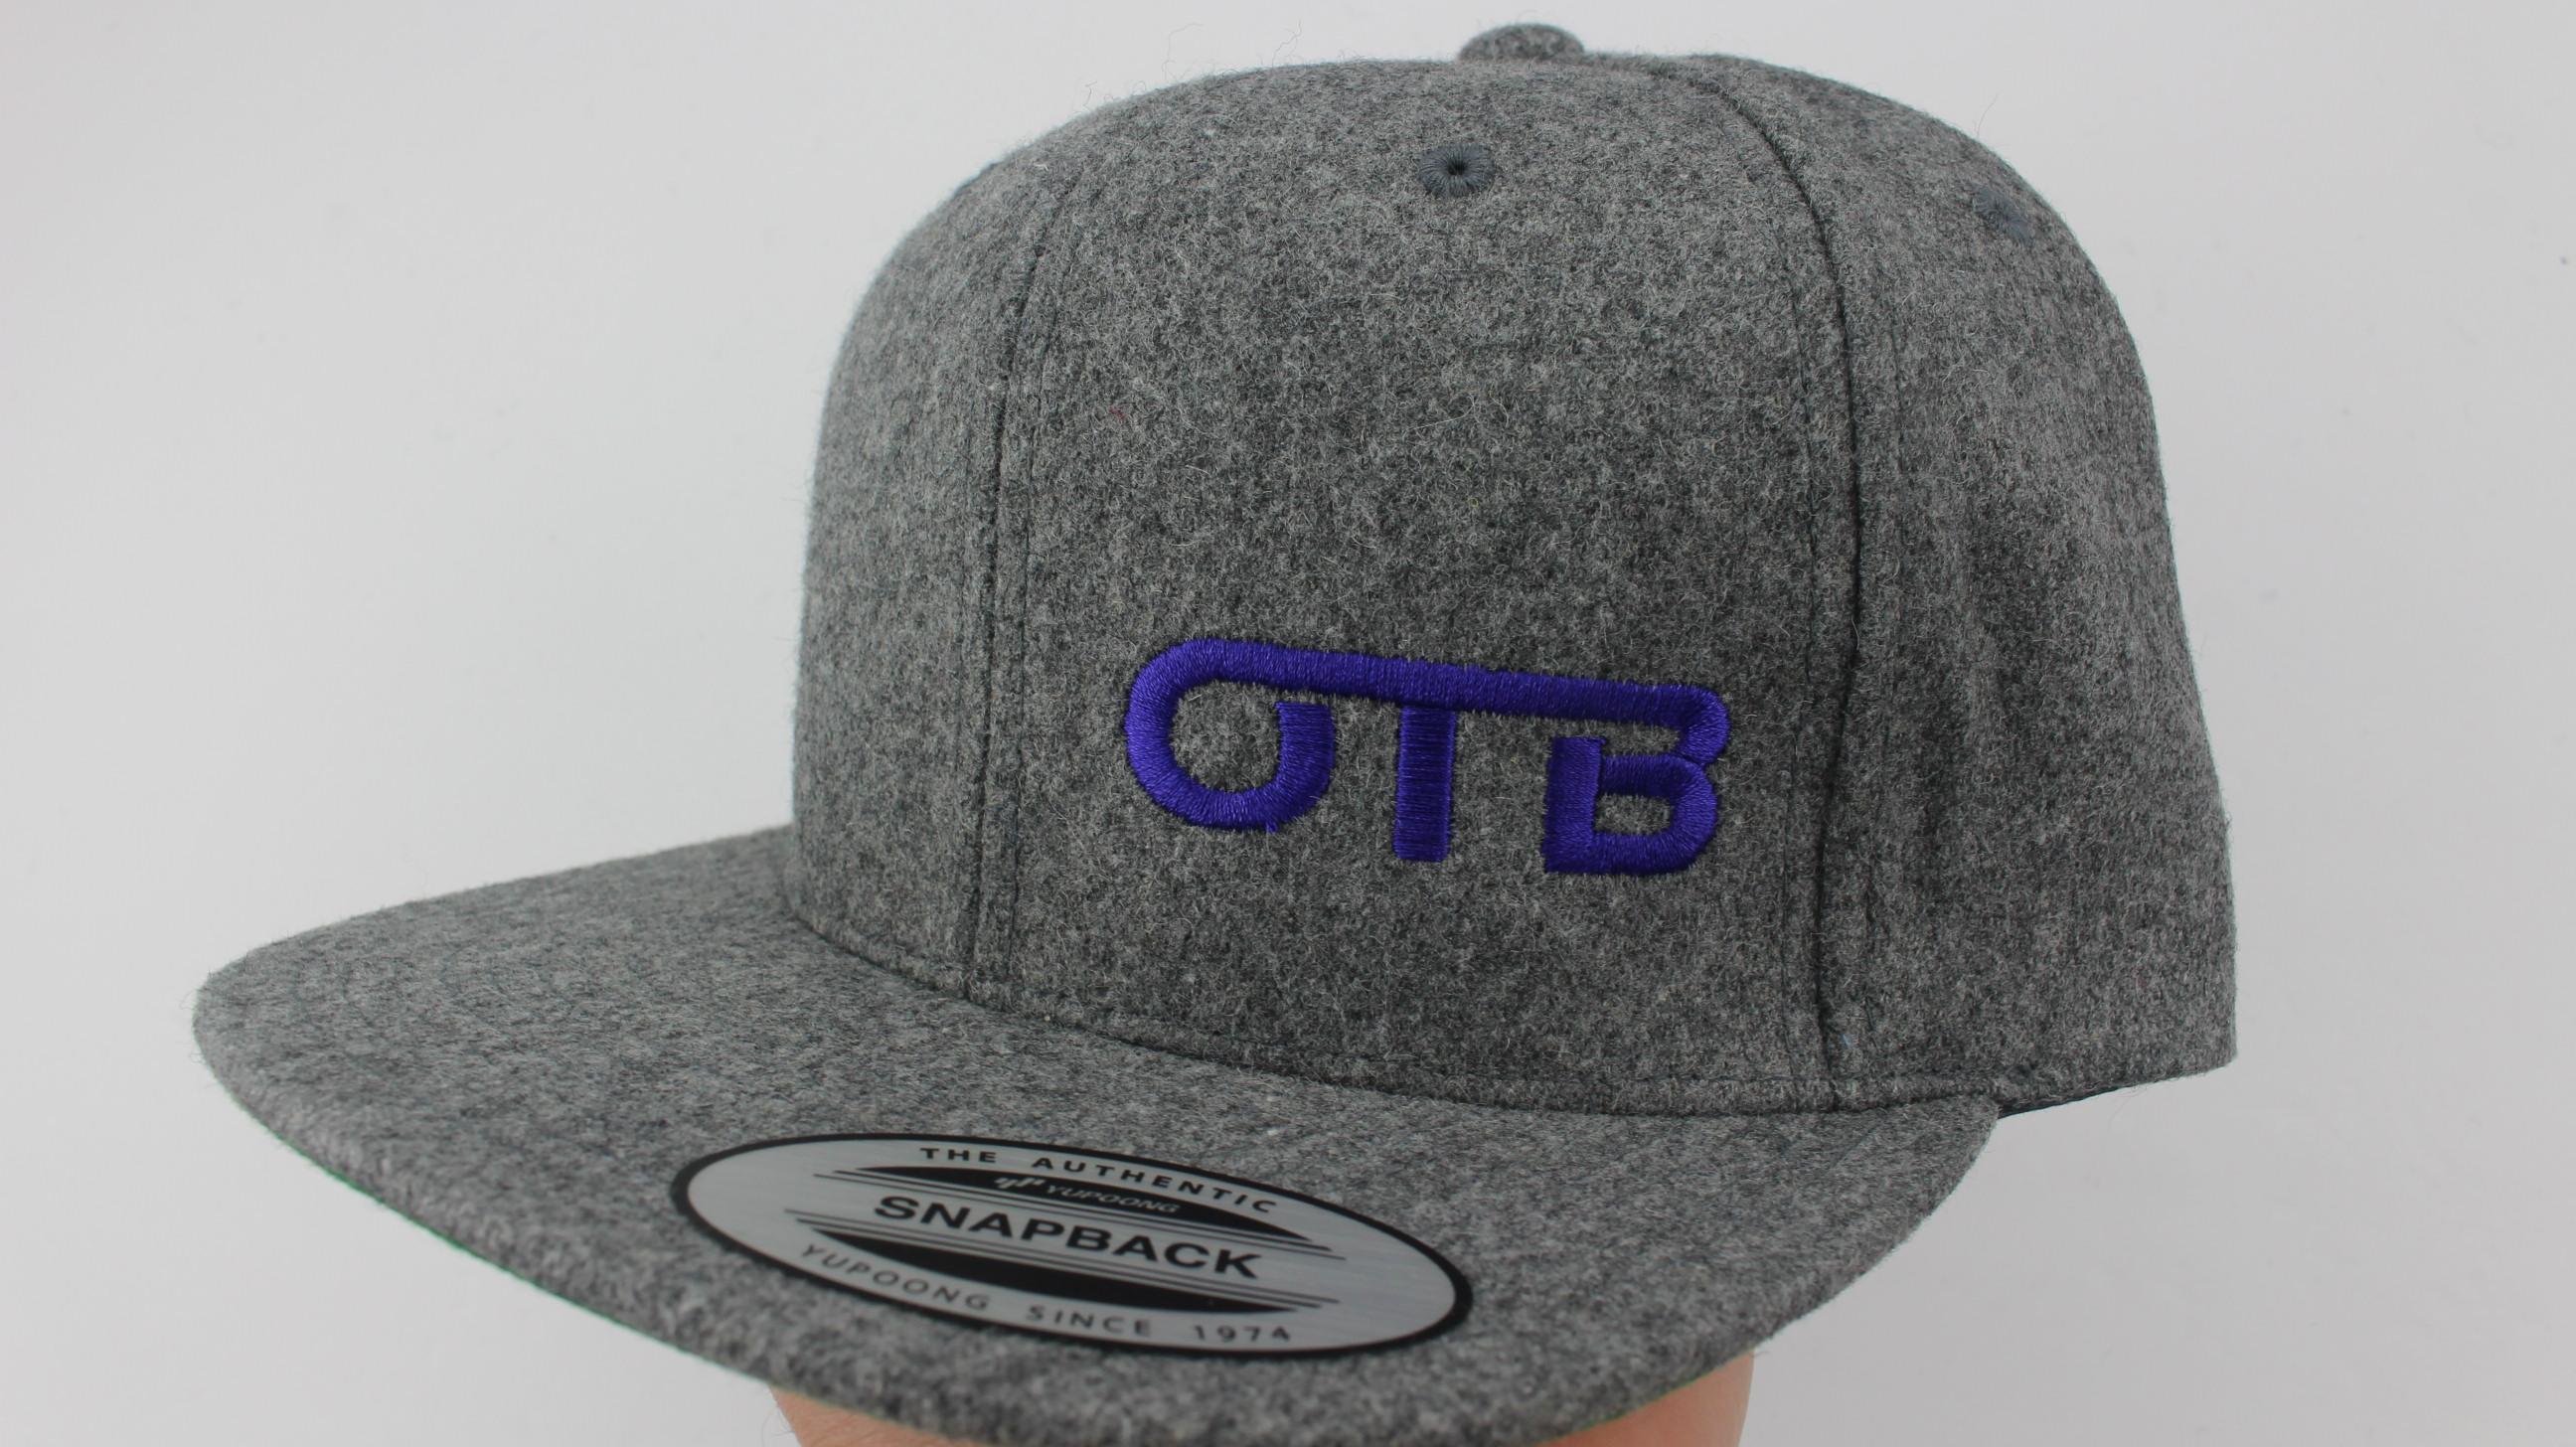 2e8e2cfe087 Flatbill Snapback Hat - heather-wool - 1264 - purple